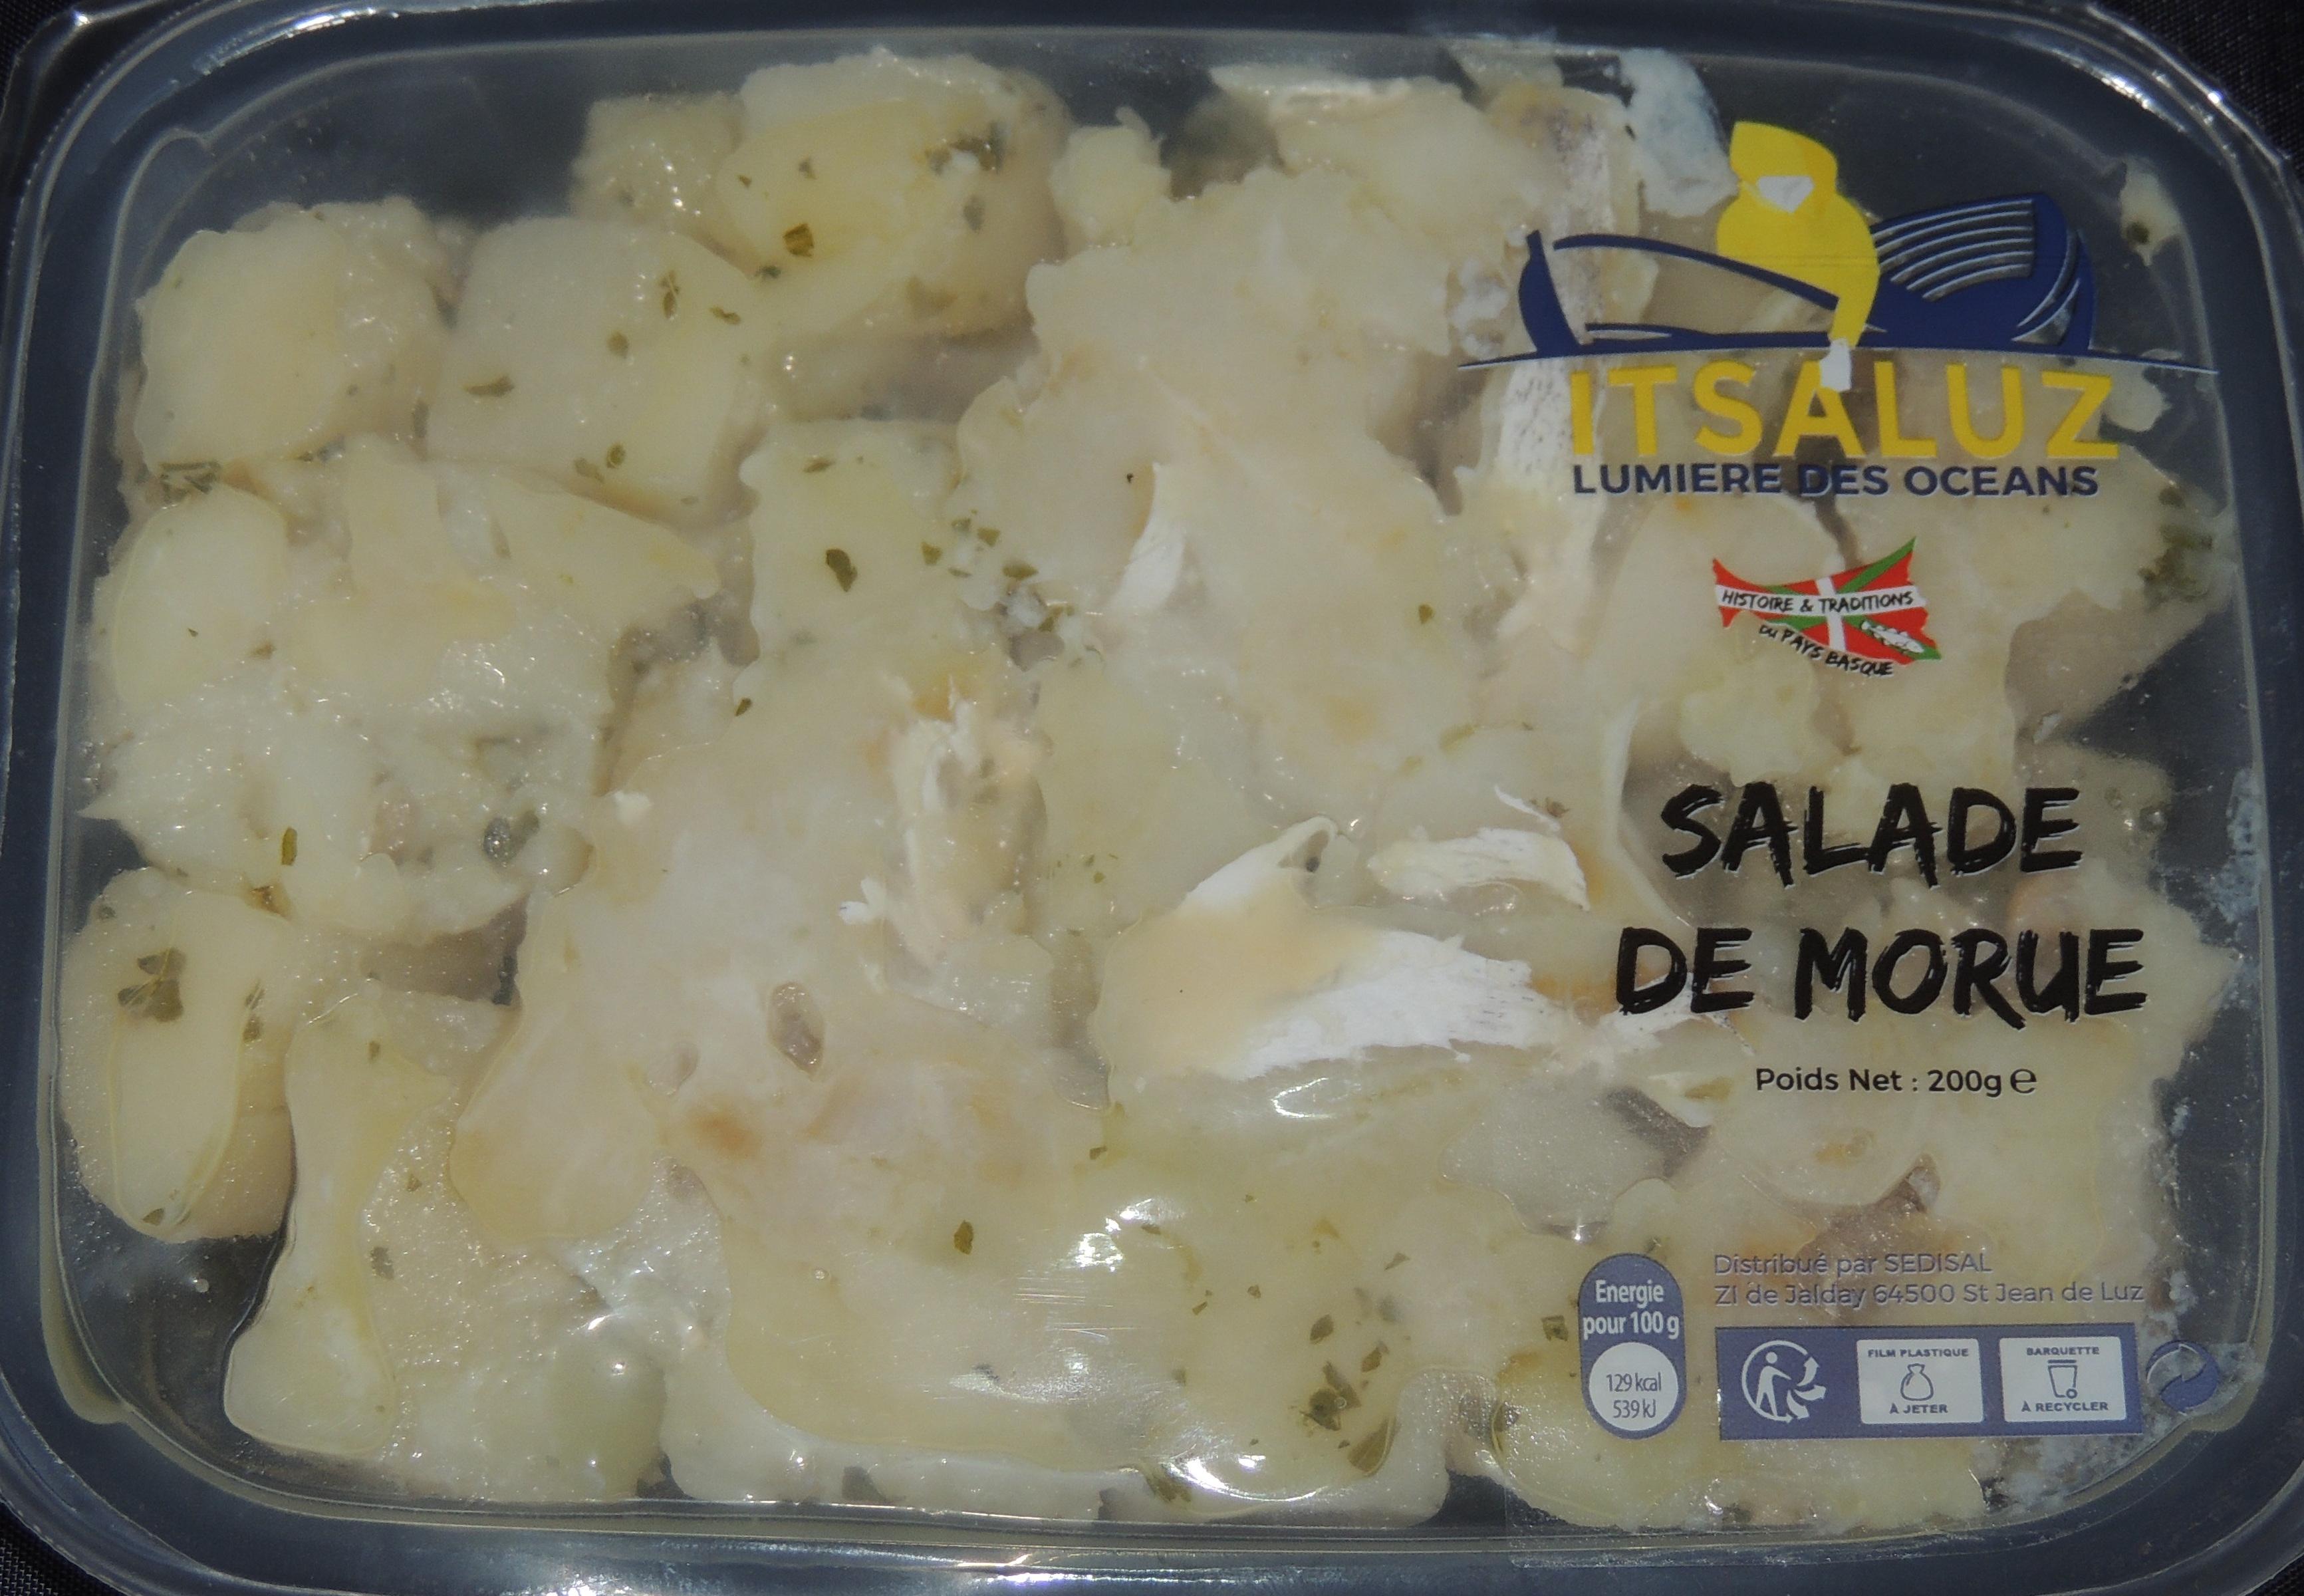 Salade de morue, Itsaluz (200 g)